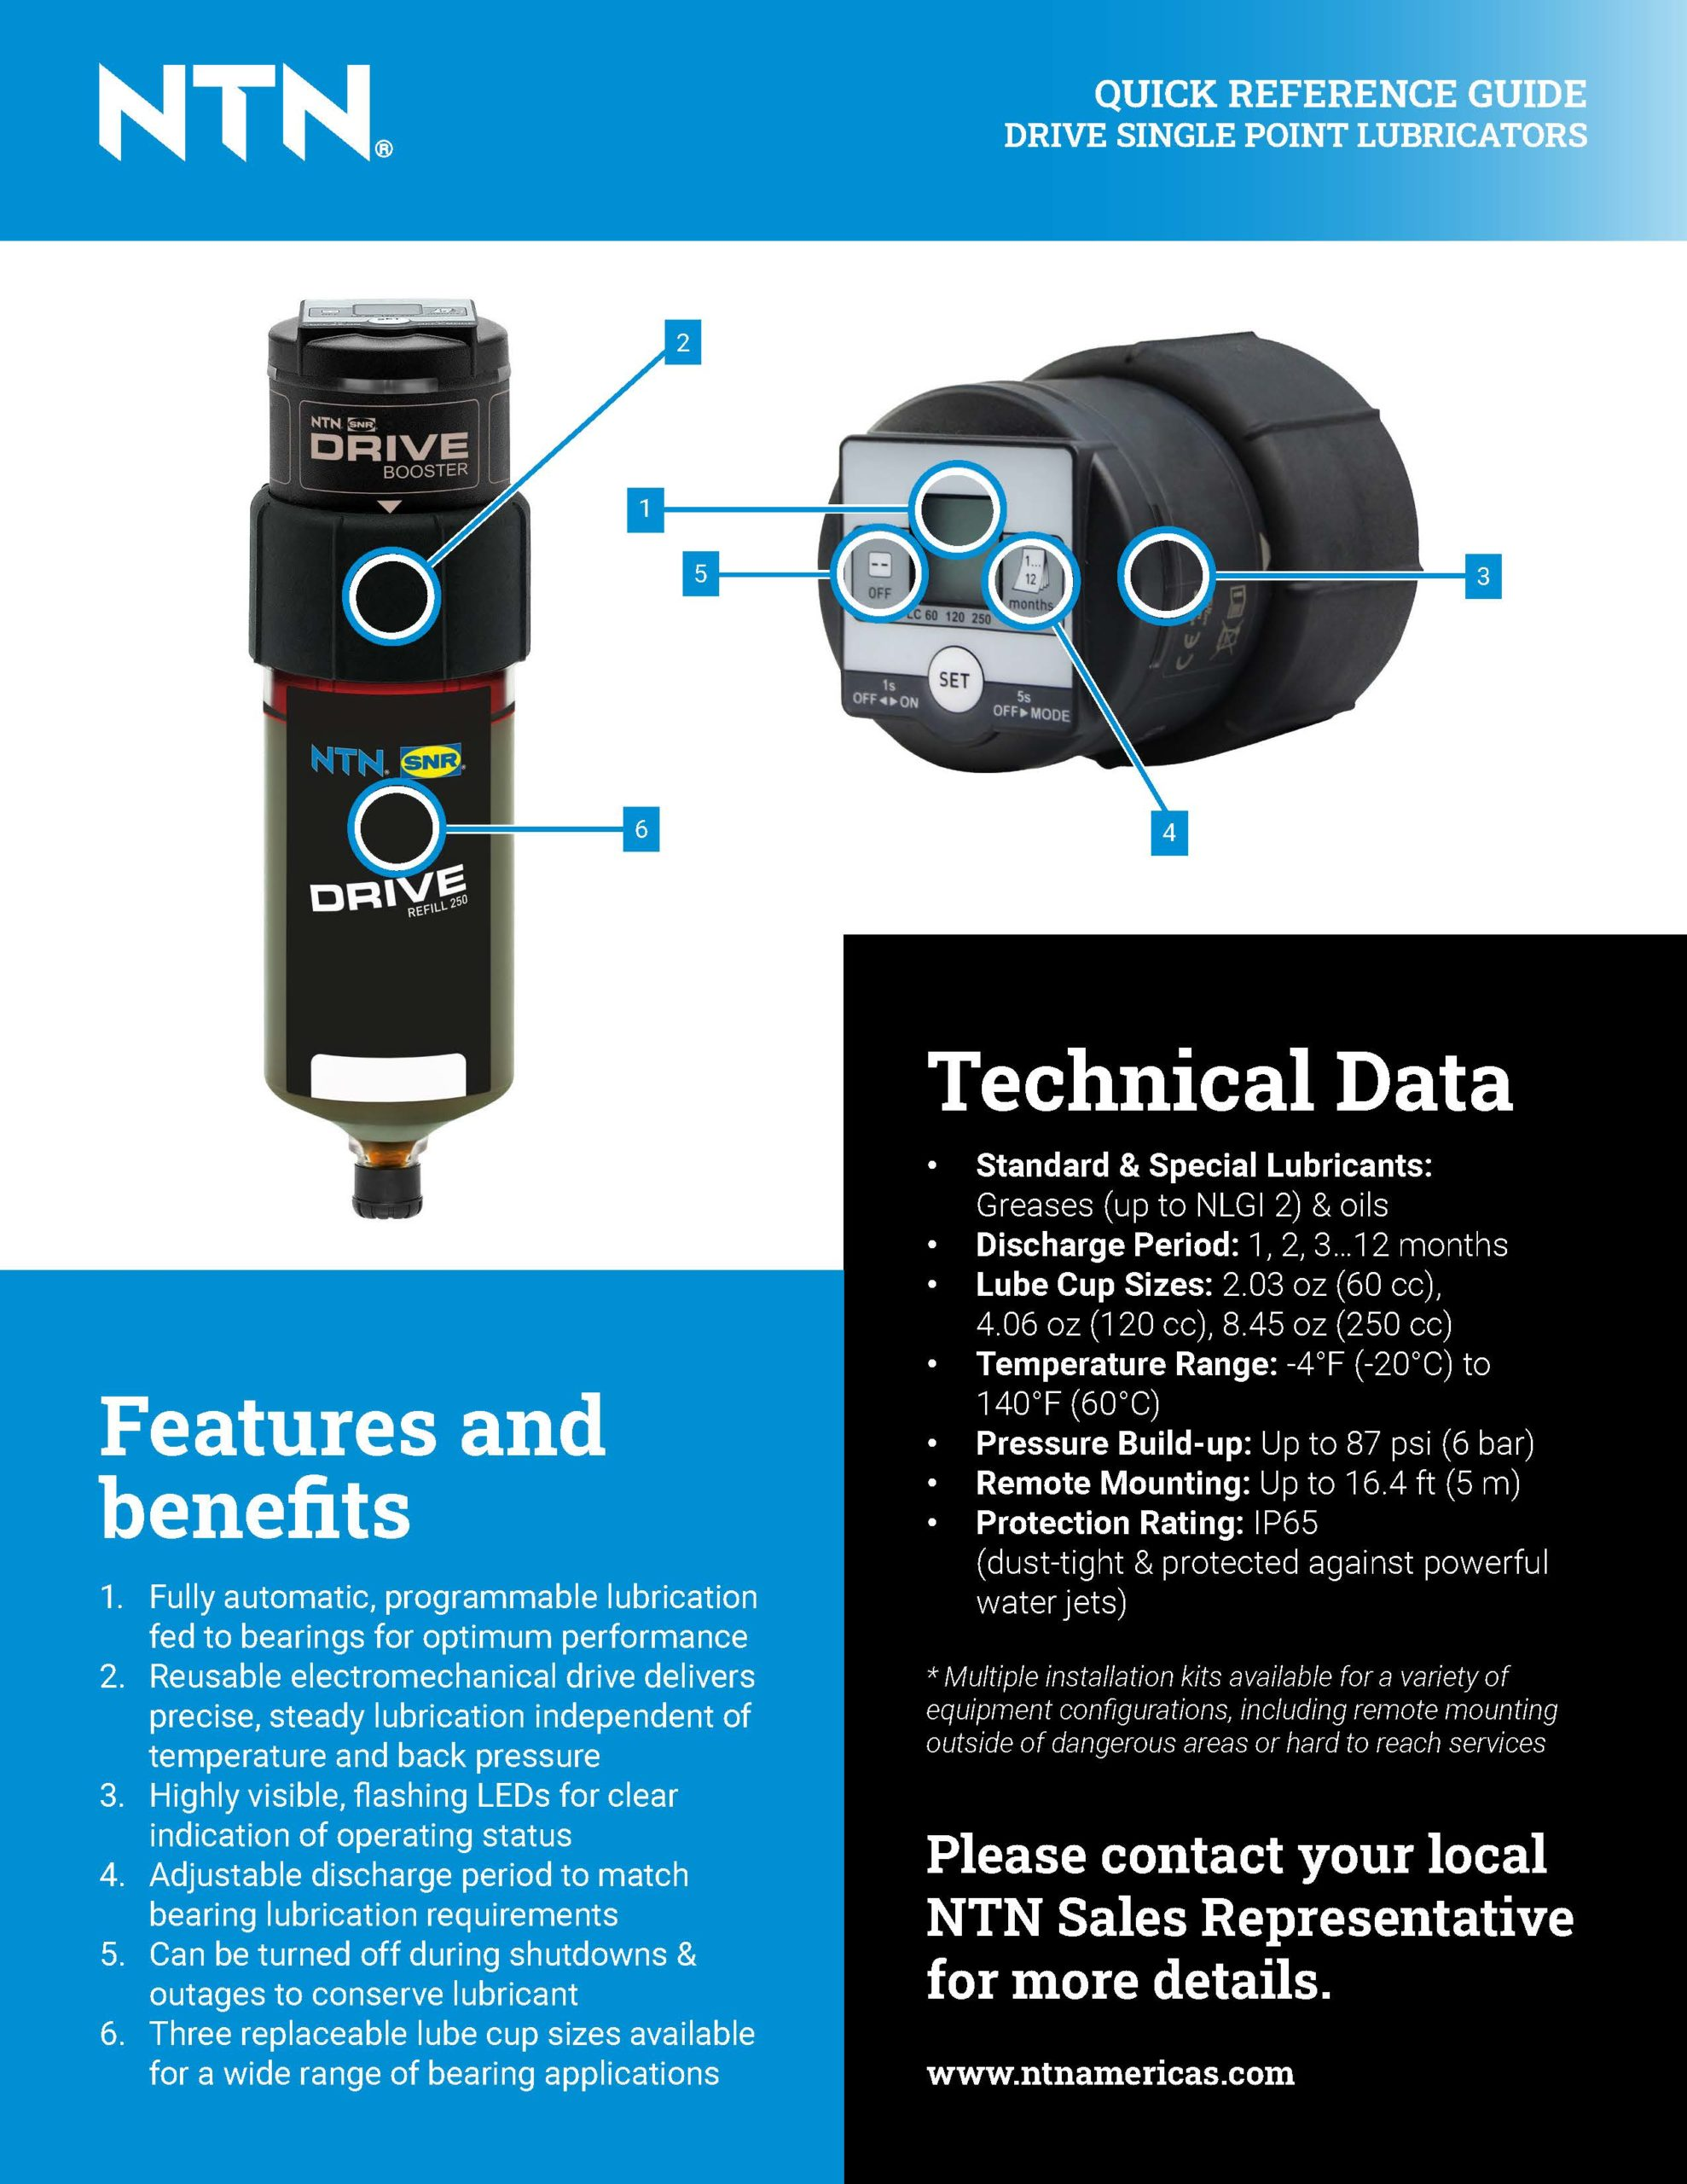 NTN Drive Single Point Lubricators